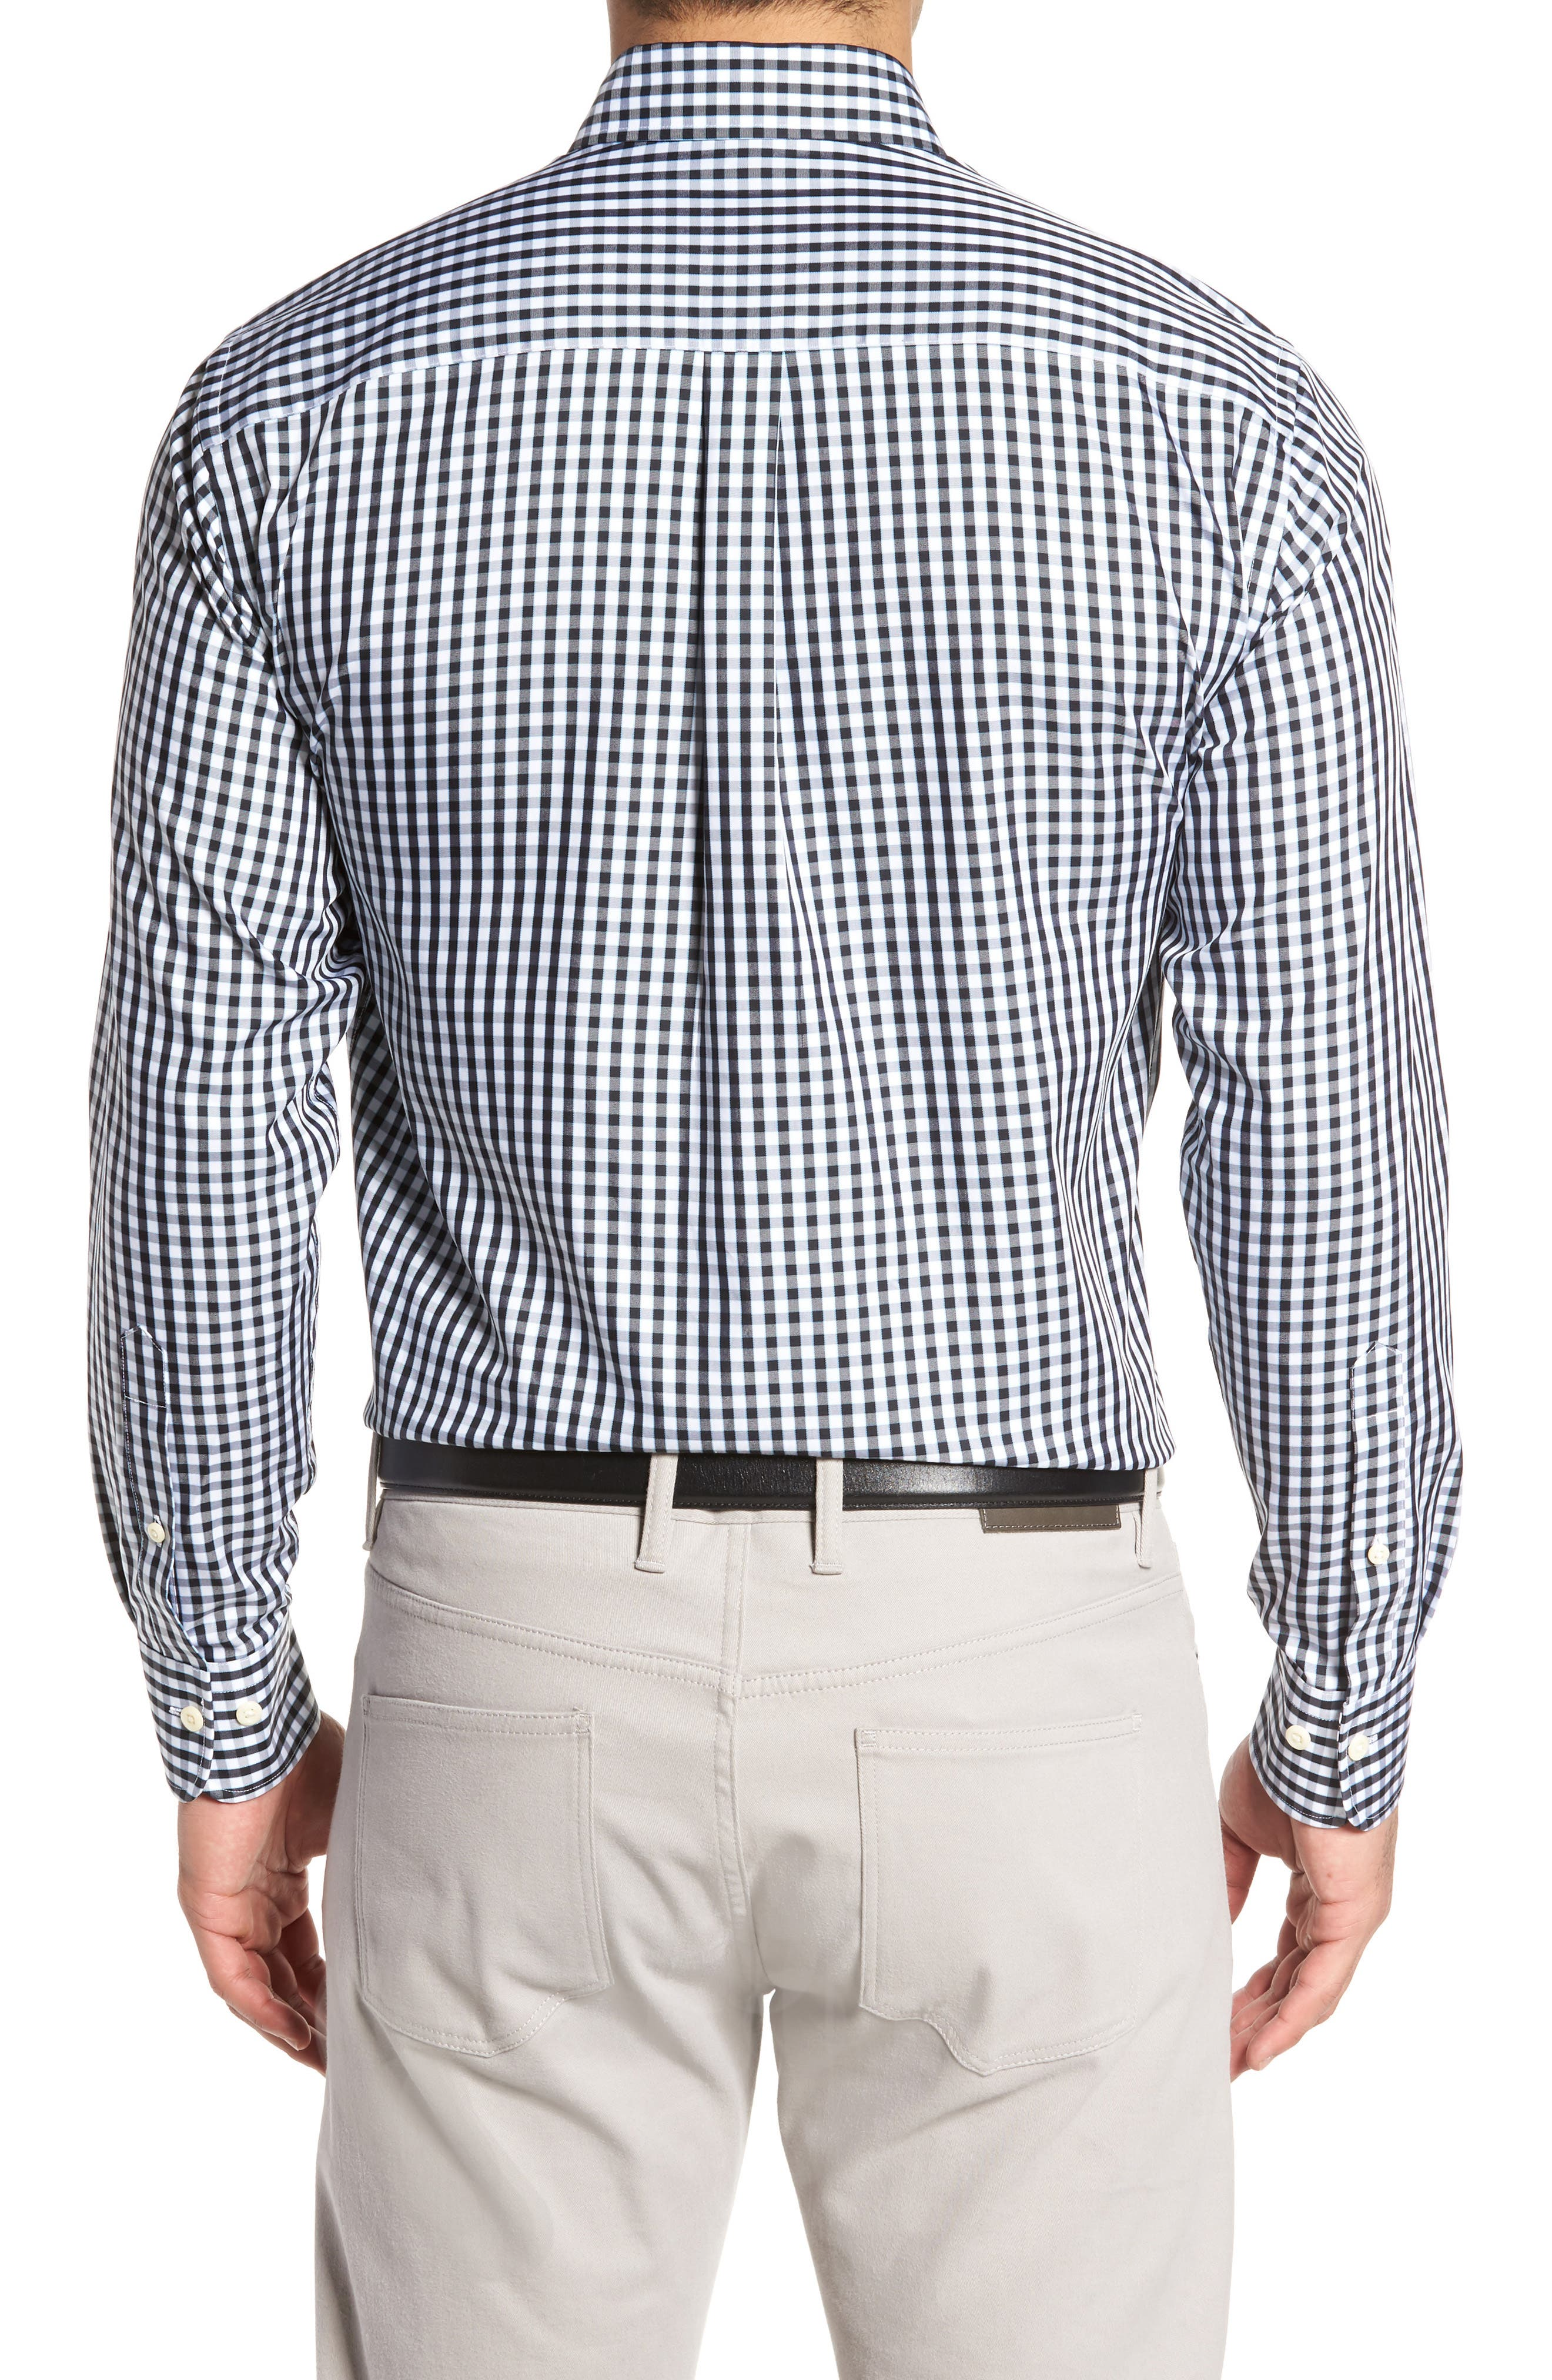 PETER MILLAR, Black Sand Regular Fit Gingham Check Sport Shirt, Alternate thumbnail 2, color, BLACK